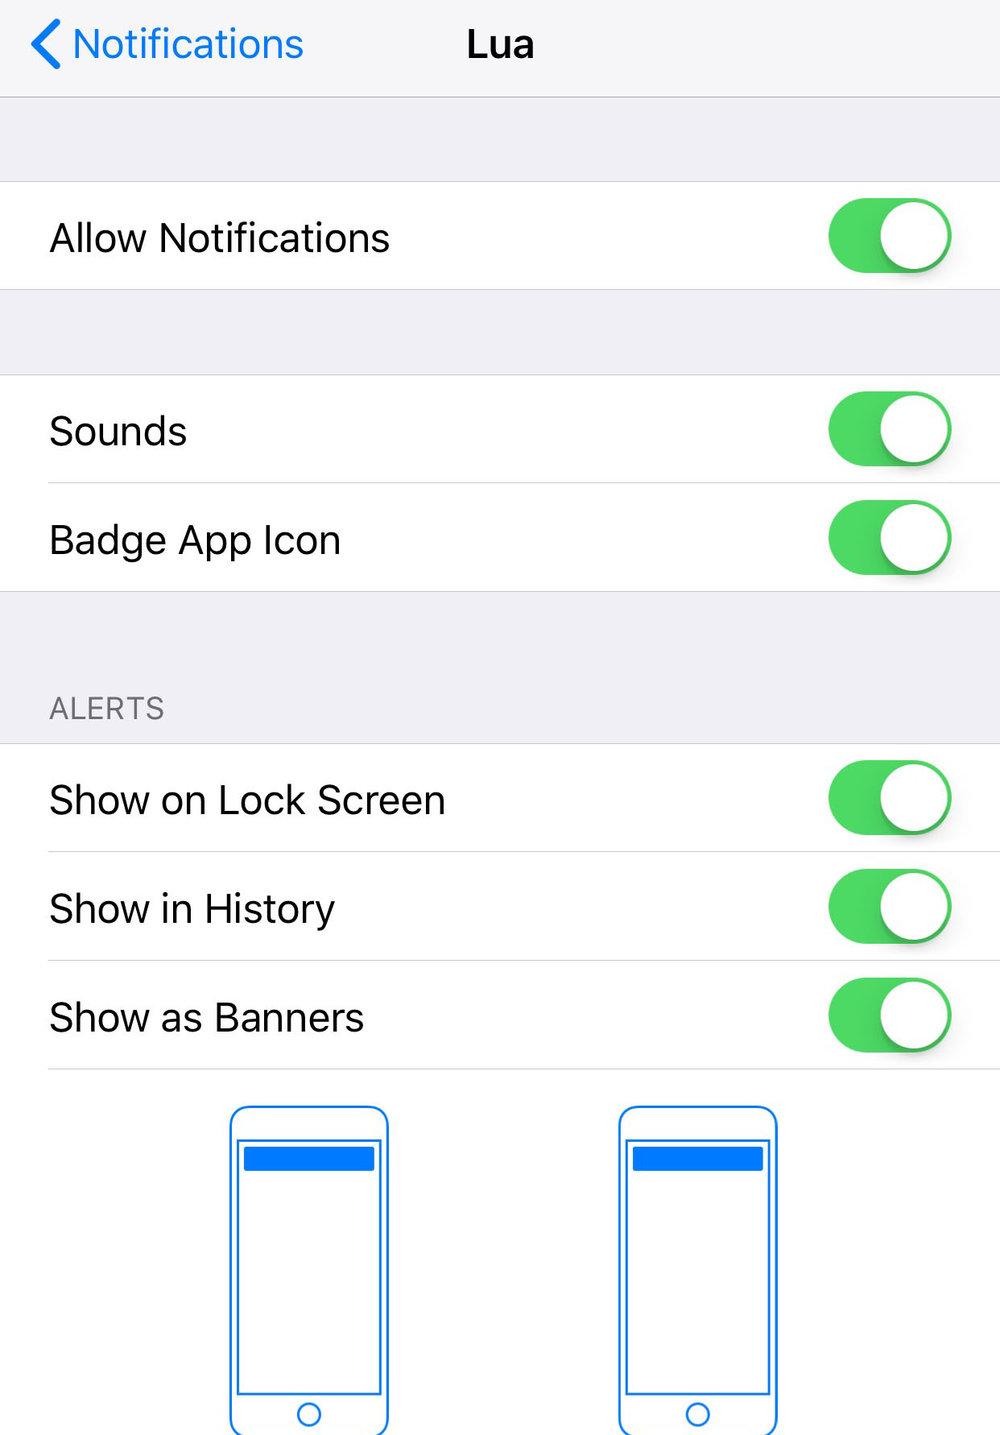 lua-notification-settings-iphone.jpg